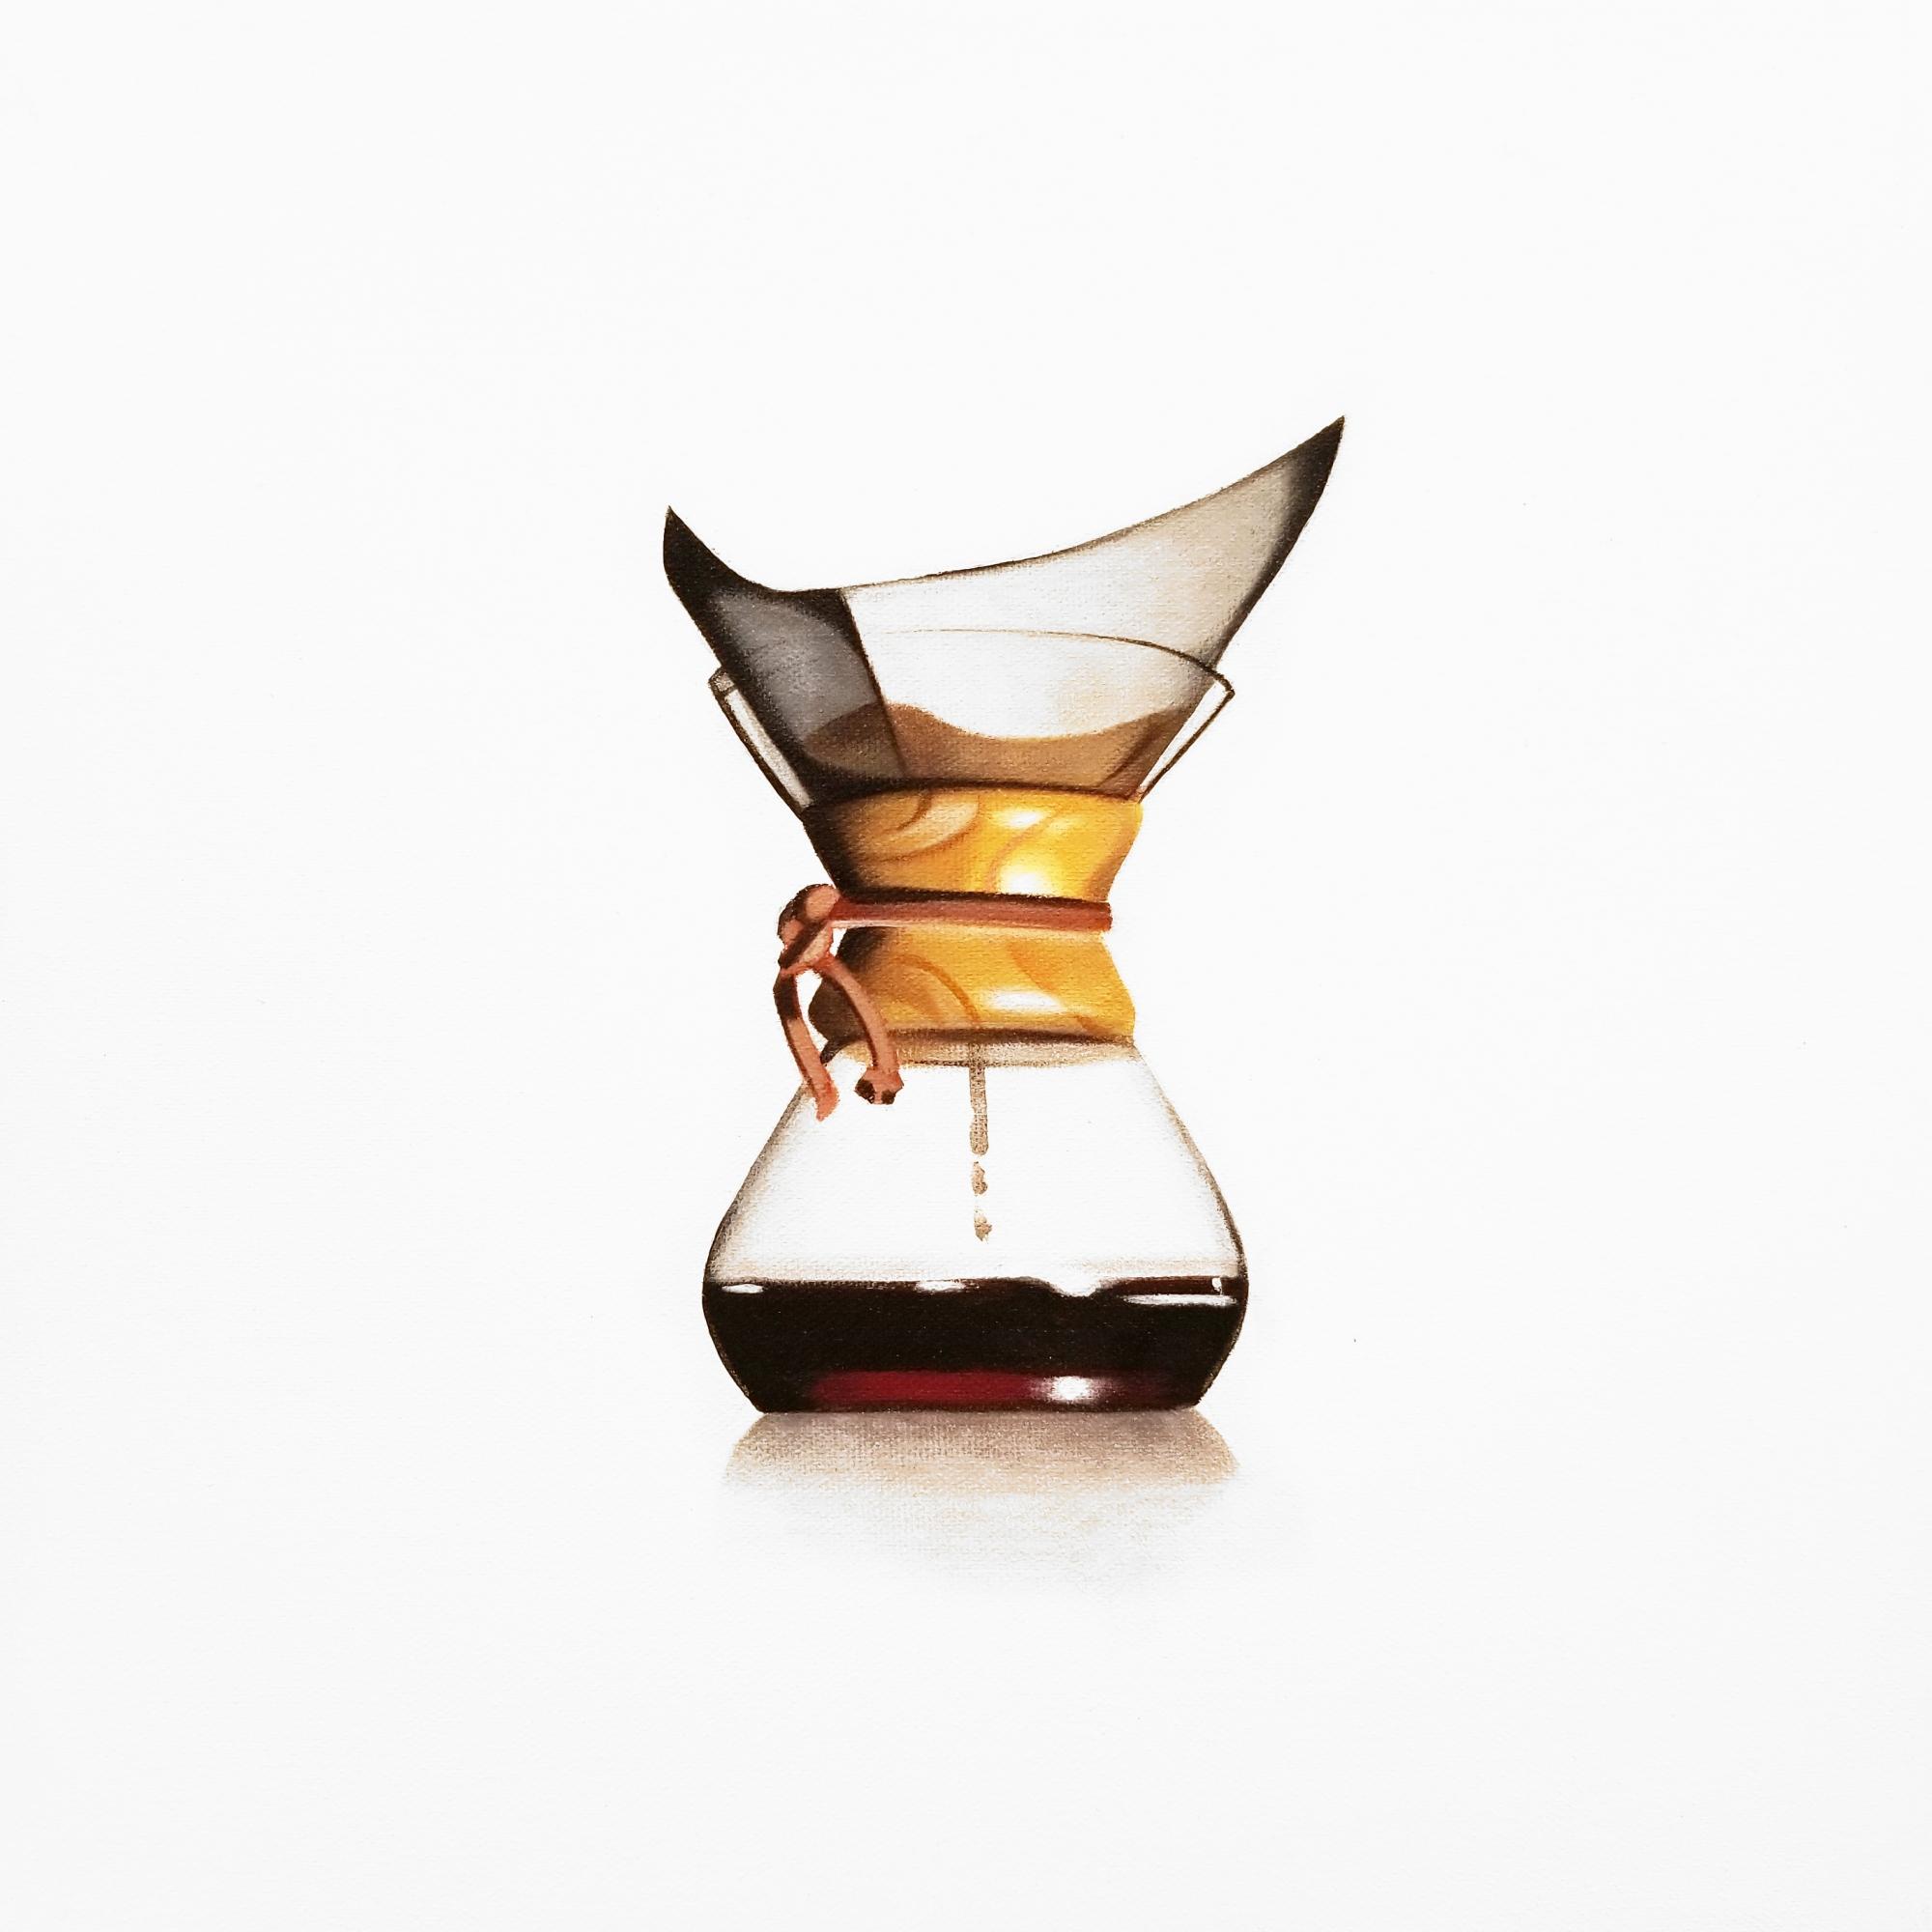 Tasting Room: Coffee Maker by Erin Rothstein